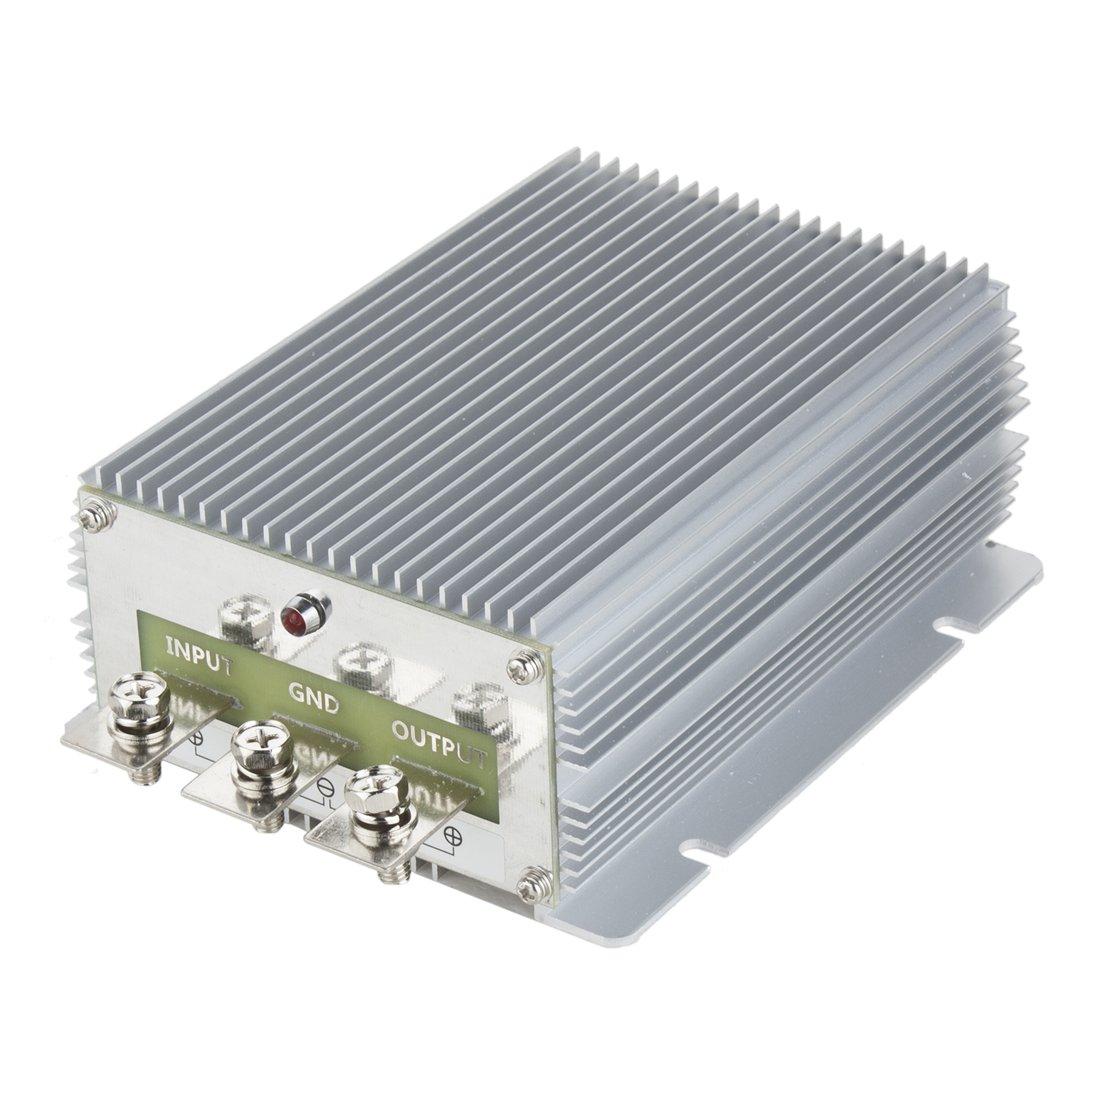 uxcell Power Voltage Converter Regulator DC 24V Step-down to DC 12V 60A 720W Car Truck Power Buck Transformer